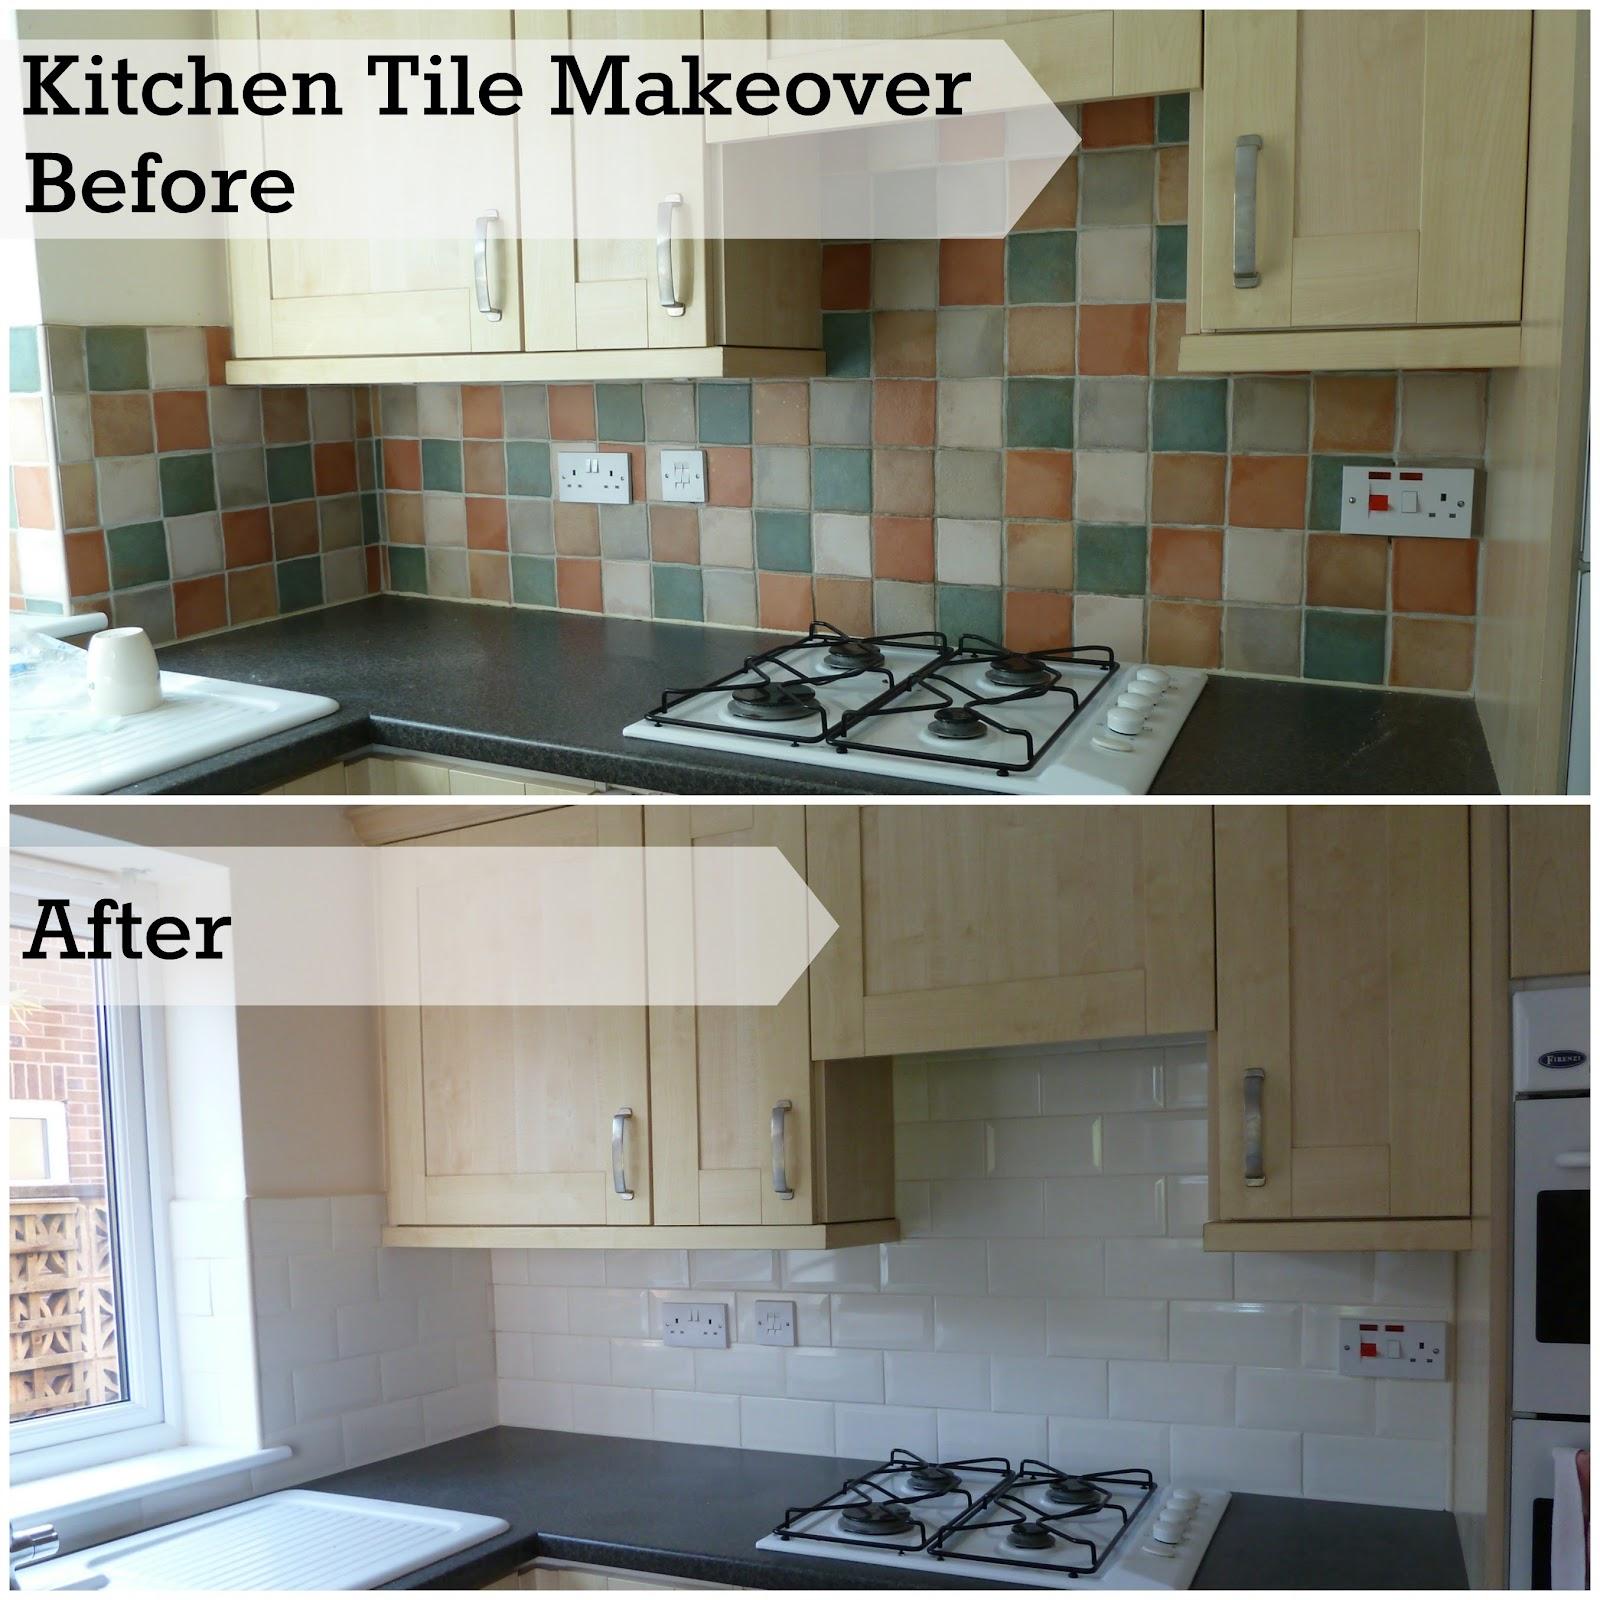 Refurbishing a kitchen new tiles